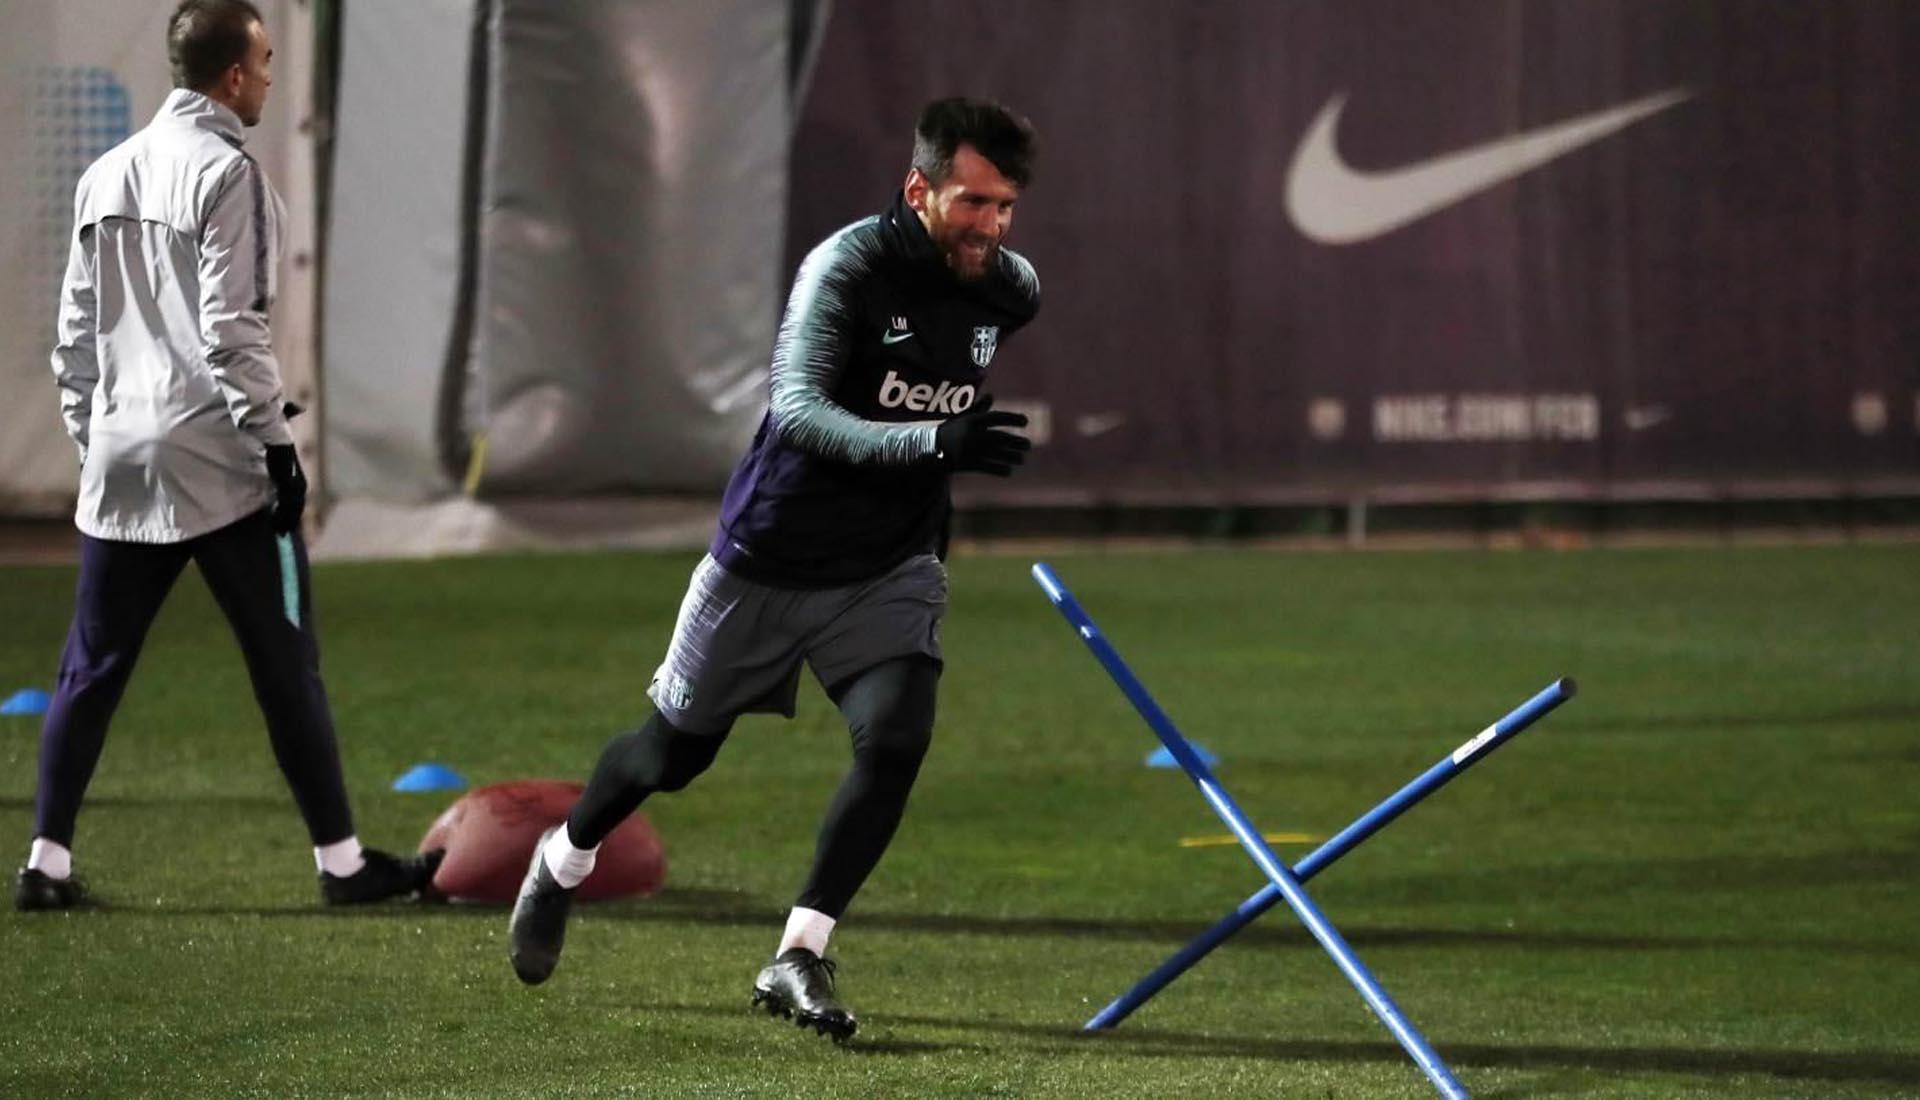 Pickering Proporzionale attraverso  Lionel Messi Trains In Blackout adidas Nemeziz Boots - SoccerBible